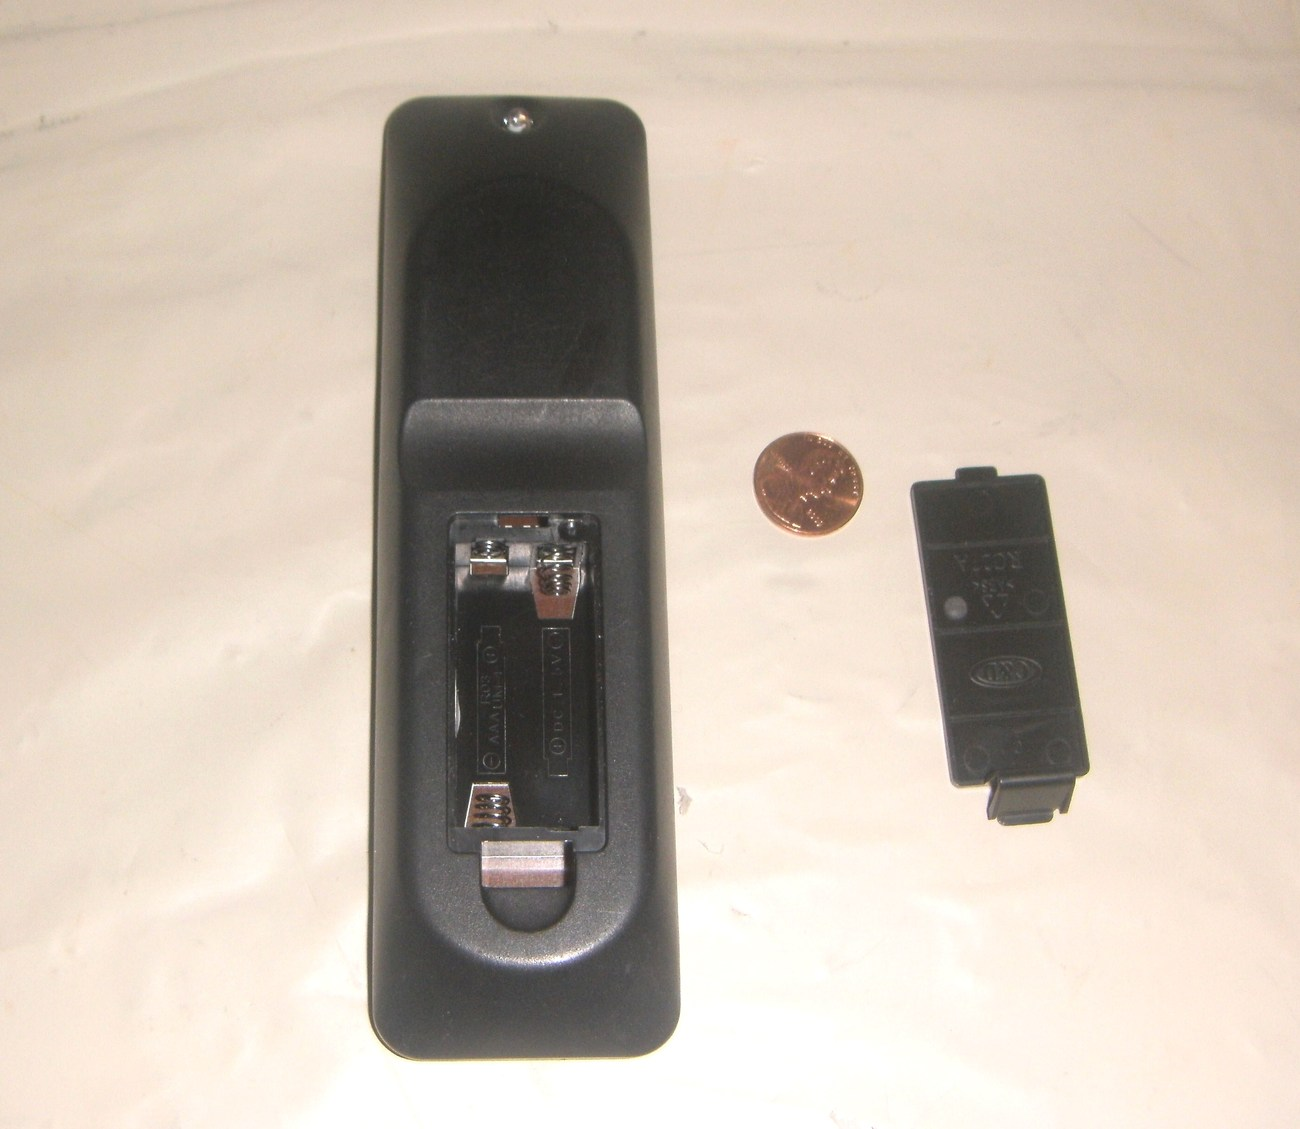 Rca rc27a remote codes